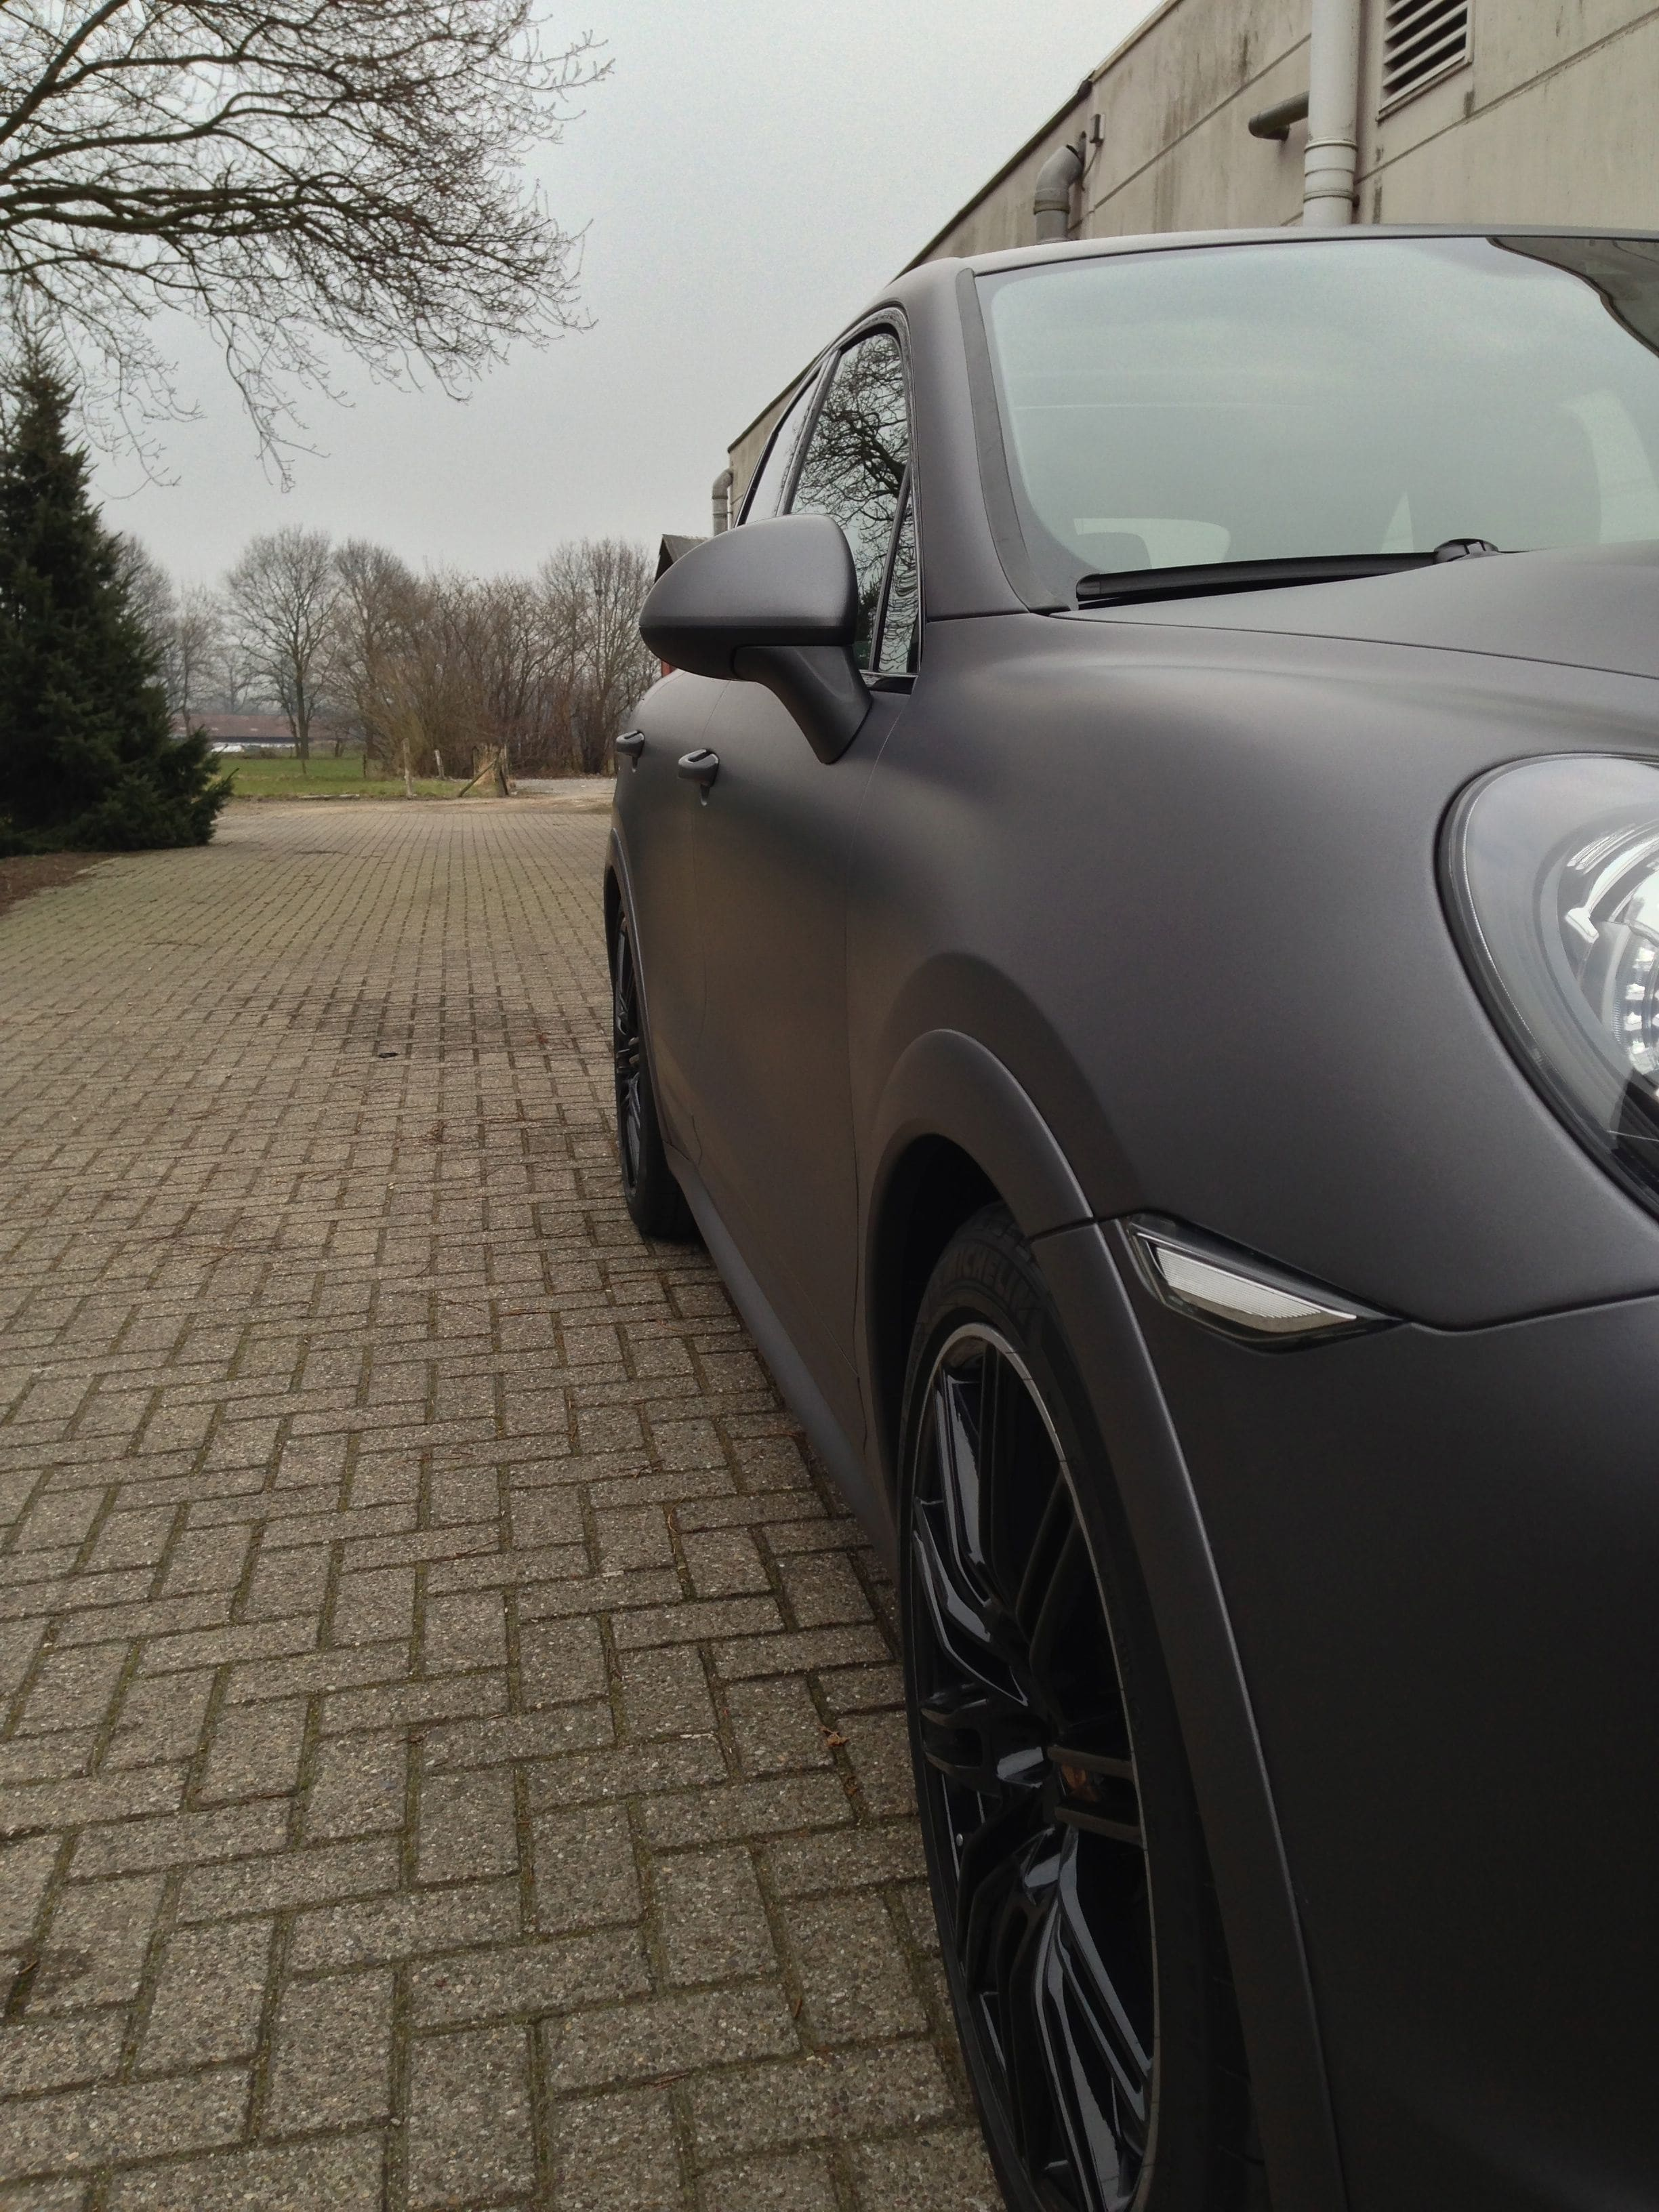 Porsche Cayenne GTS met Gunpowder Wrap, Carwrapping door Wrapmyride.nu Foto-nr:6772, ©2020